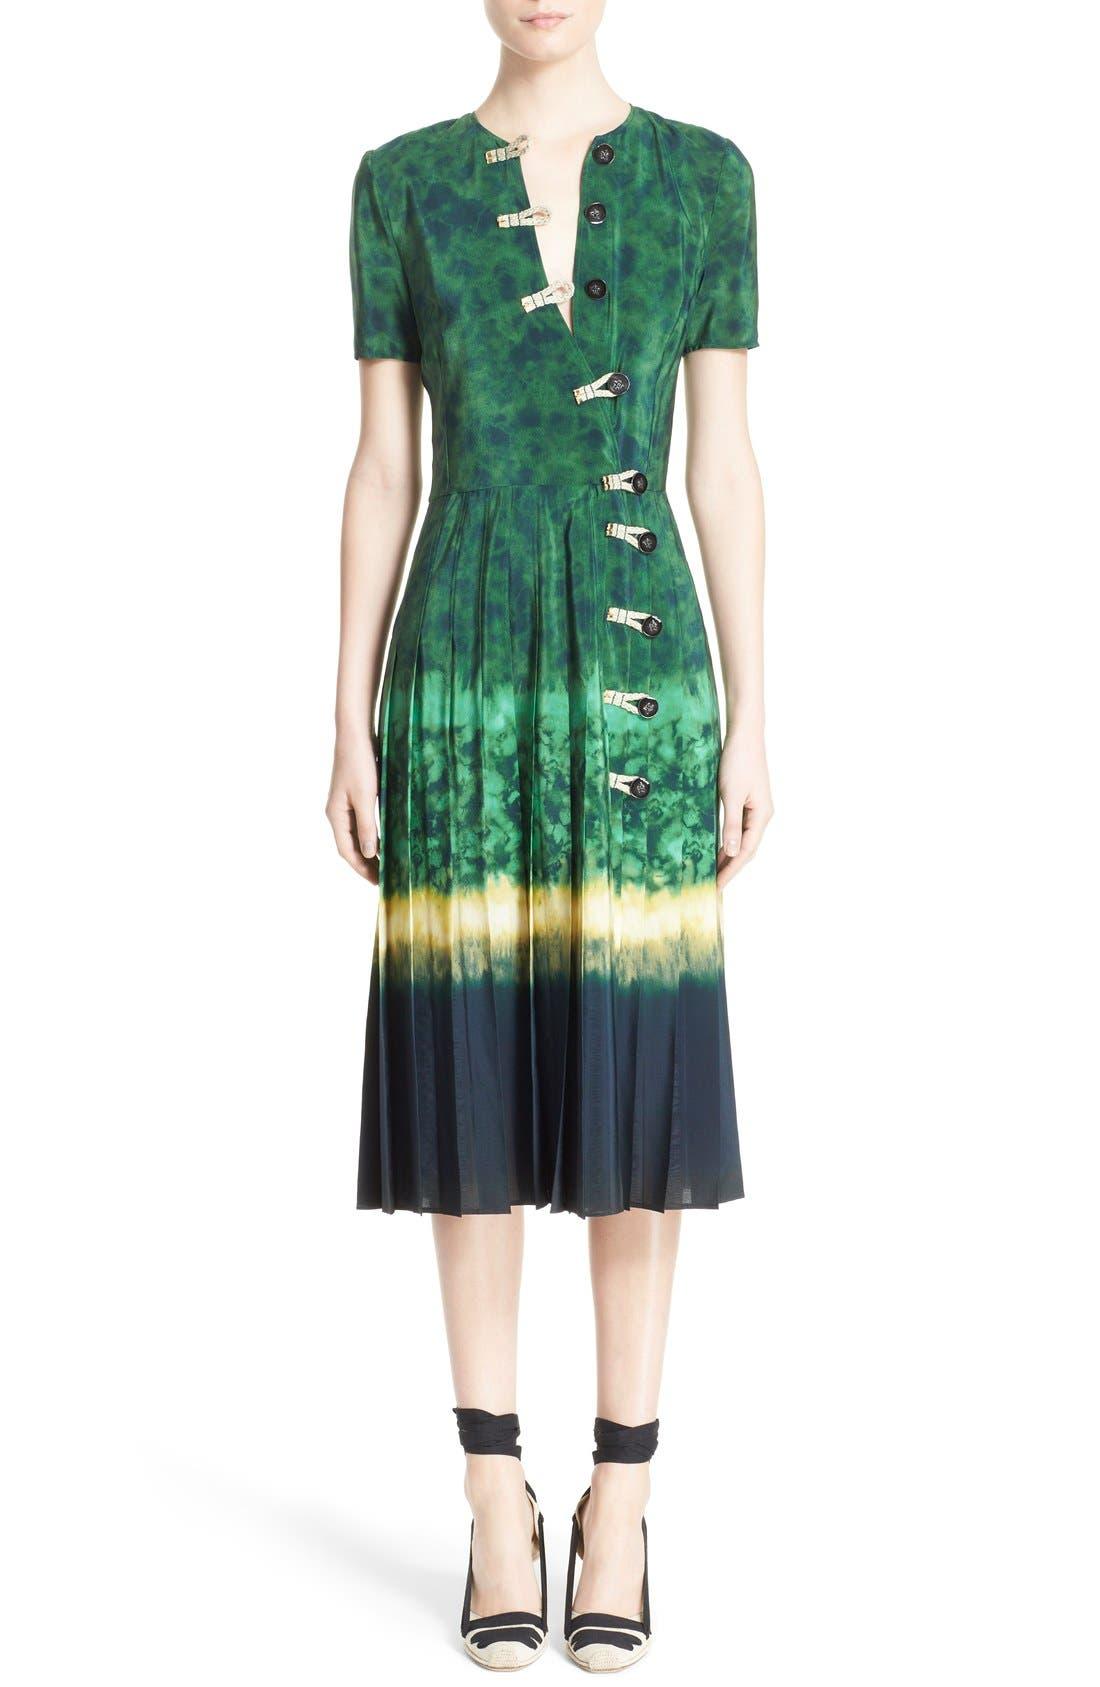 ALTUZARRA 'Ilari' Rope Closure Dip Dye Dress, Main, color, 340